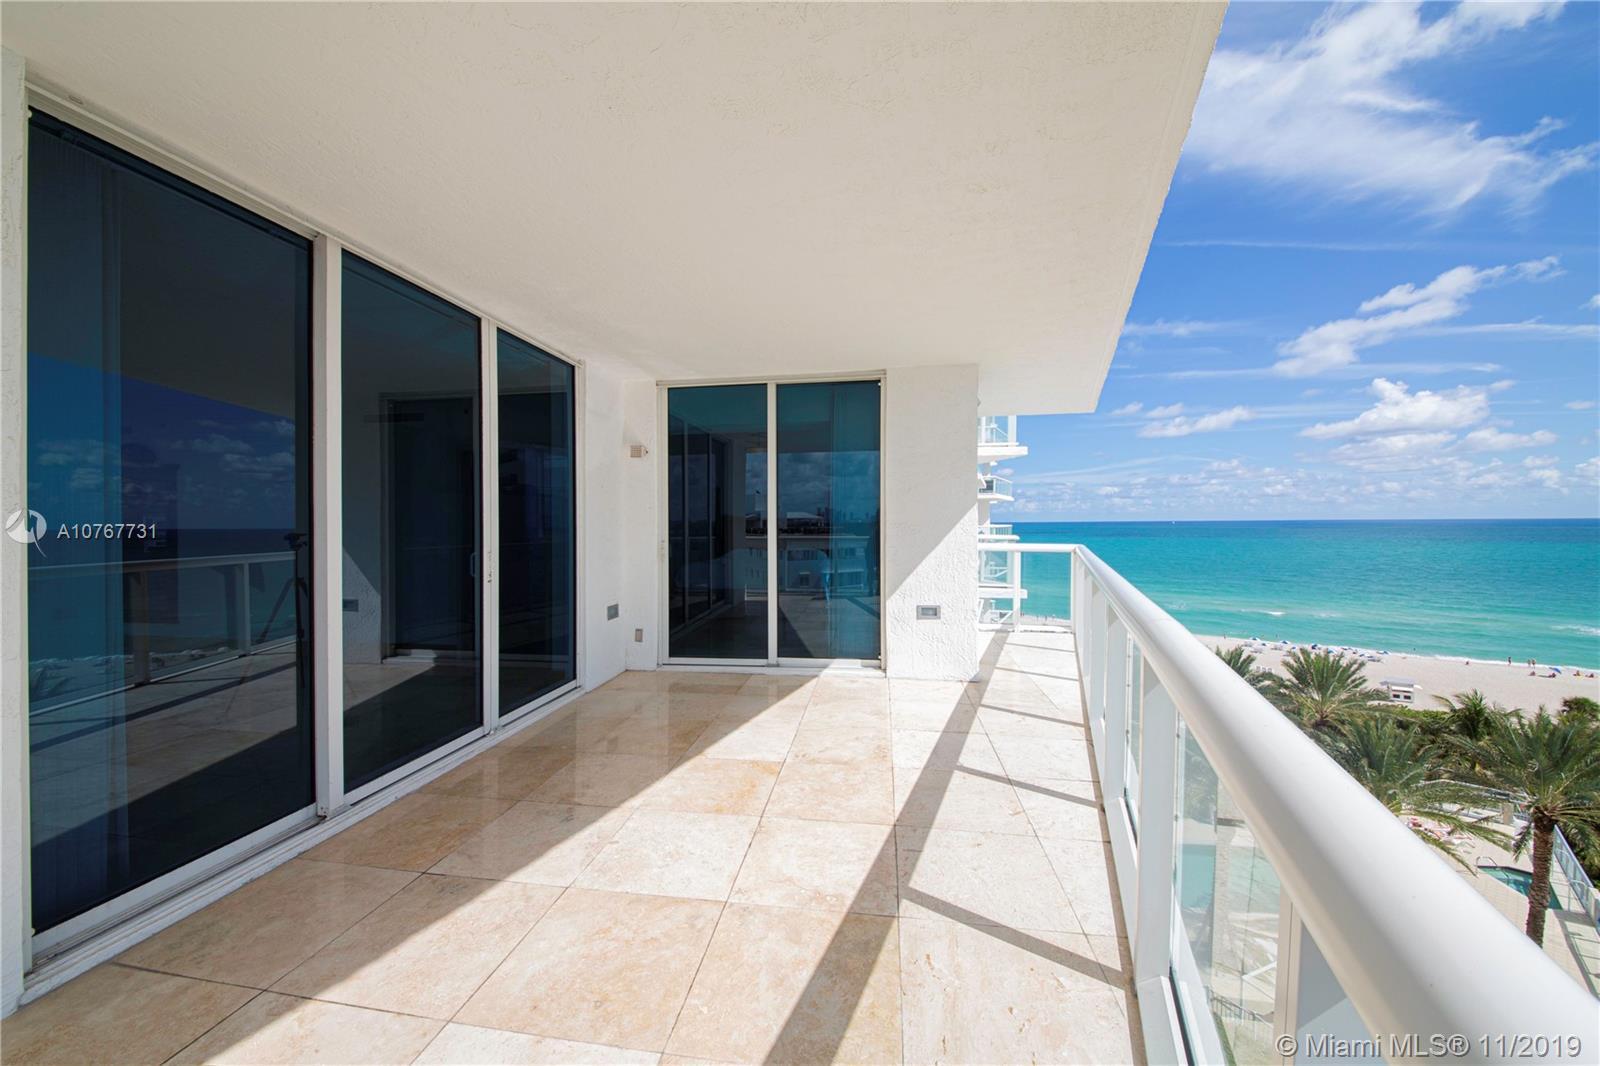 3801 Collins Ave, 901 - Miami Beach, Florida